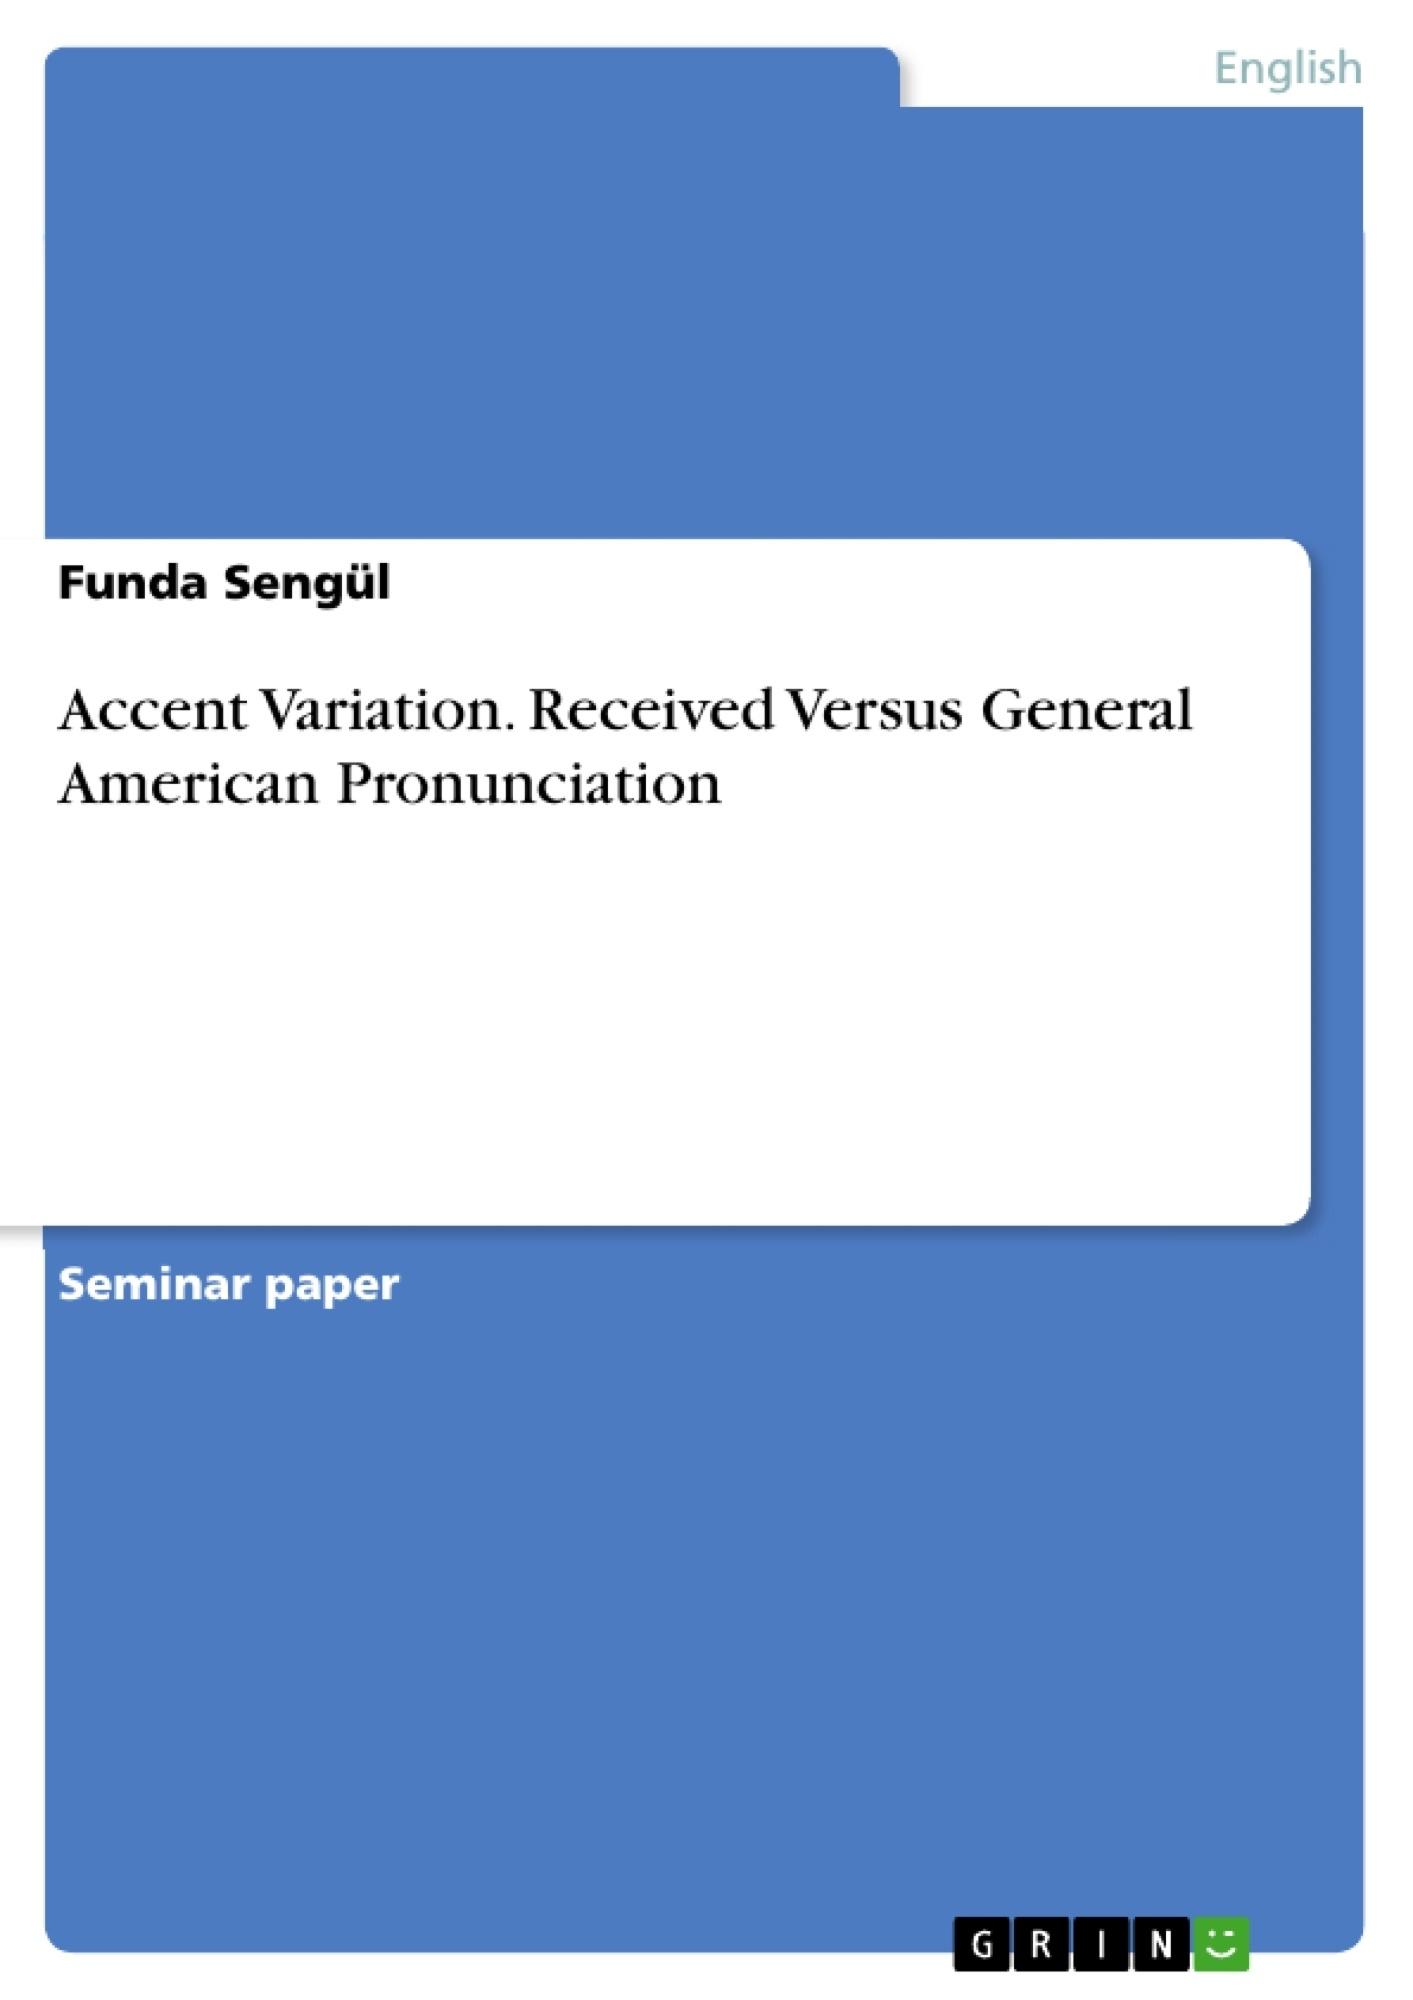 Title: Accent Variation. Received Versus General American Pronunciation